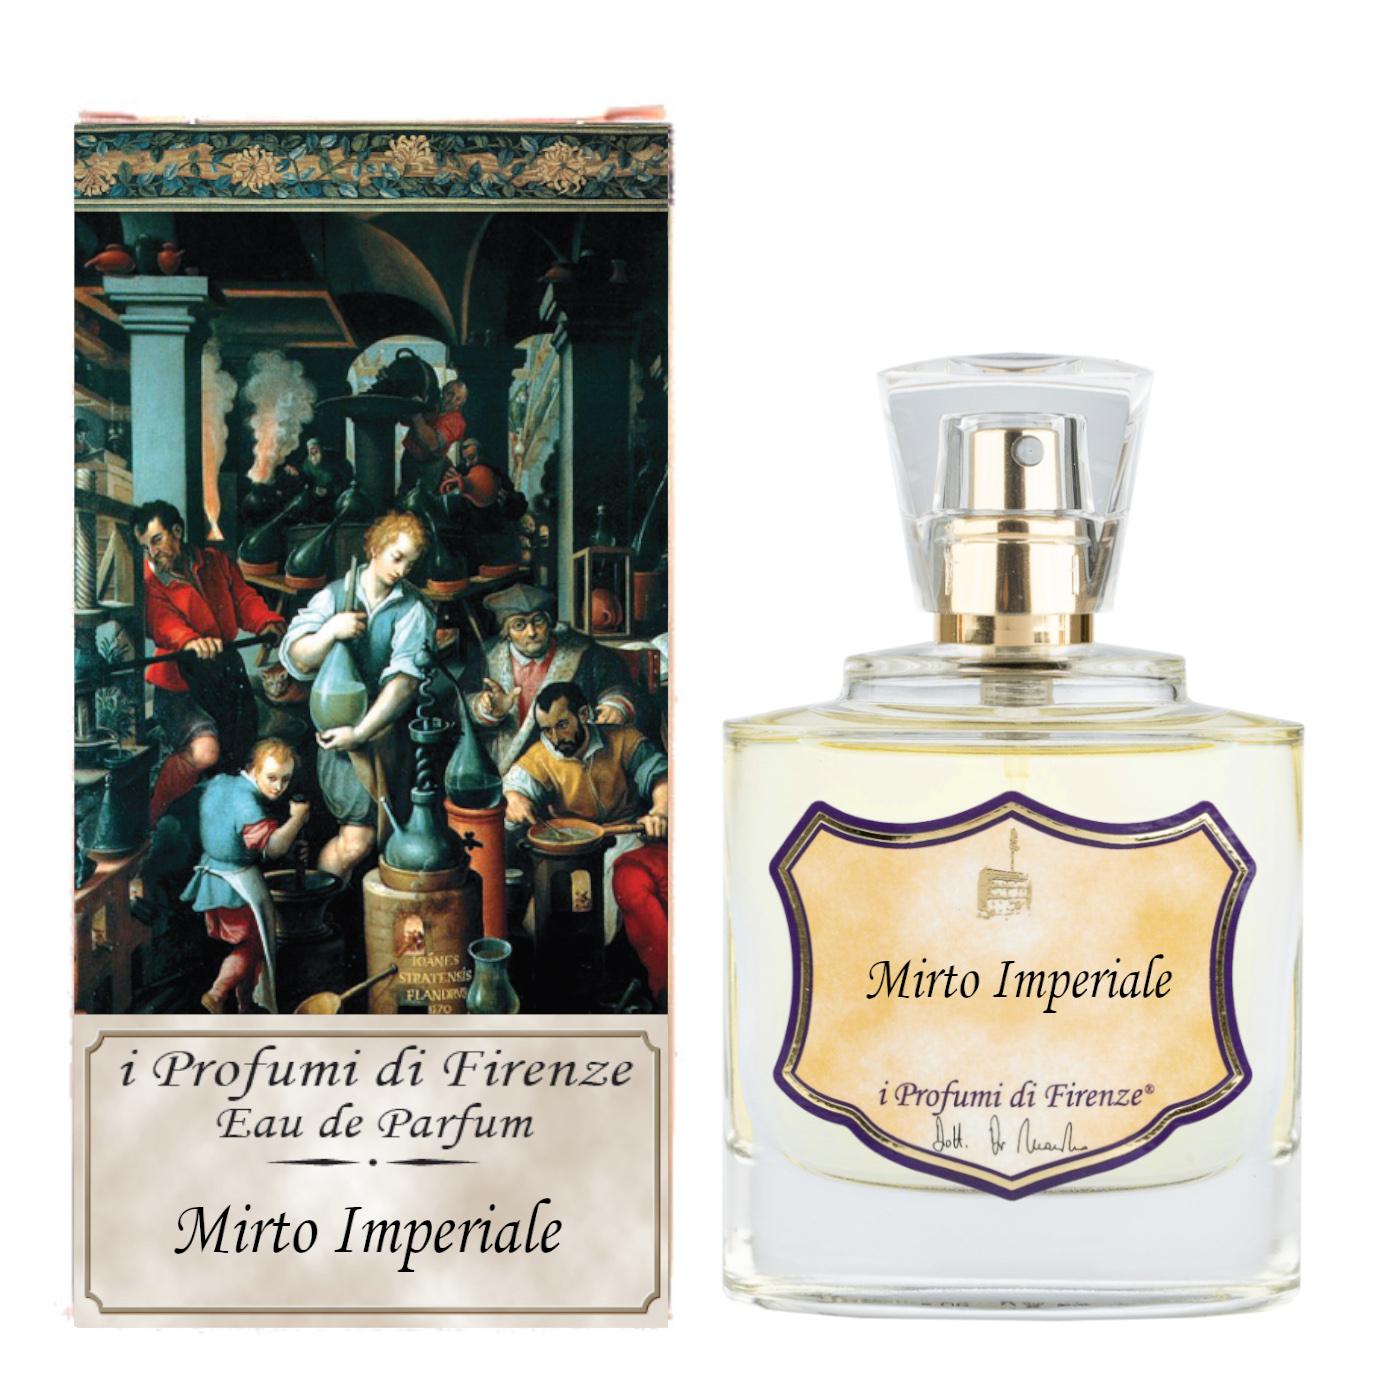 MIRTO IMPERIALE - Eau de Parfum-4113